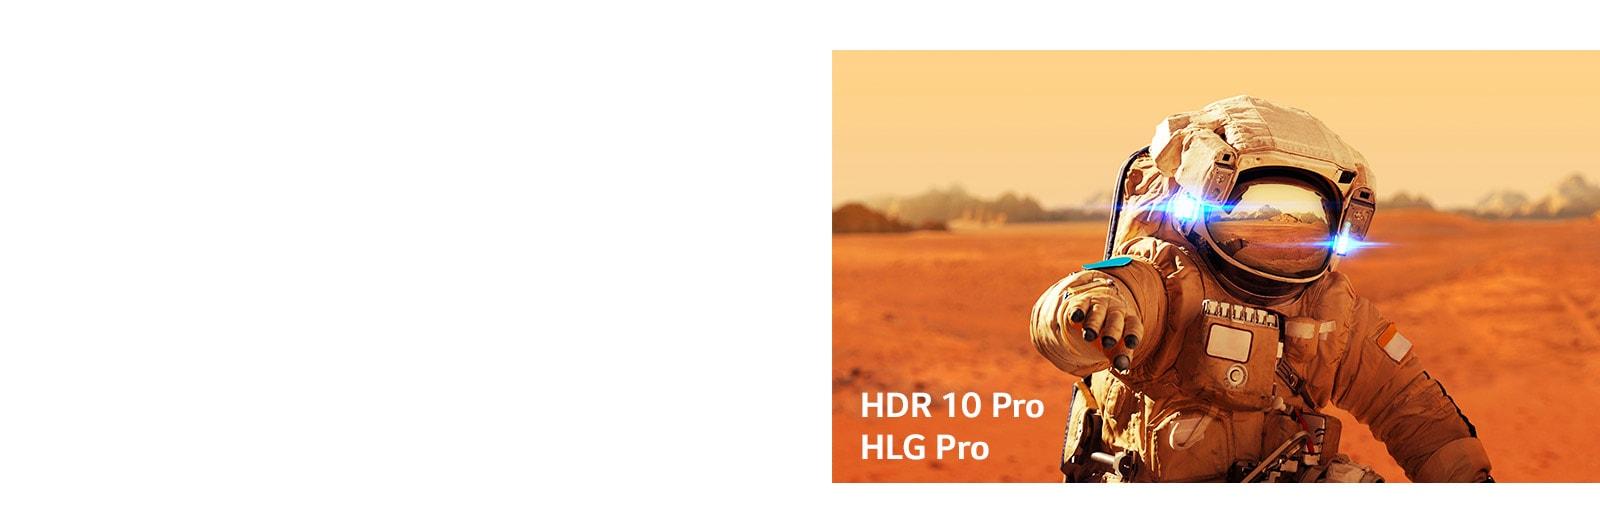 Картички за надписи на Marvel Iron Man, с логотипите на HLG pro и HDR 10 Pro